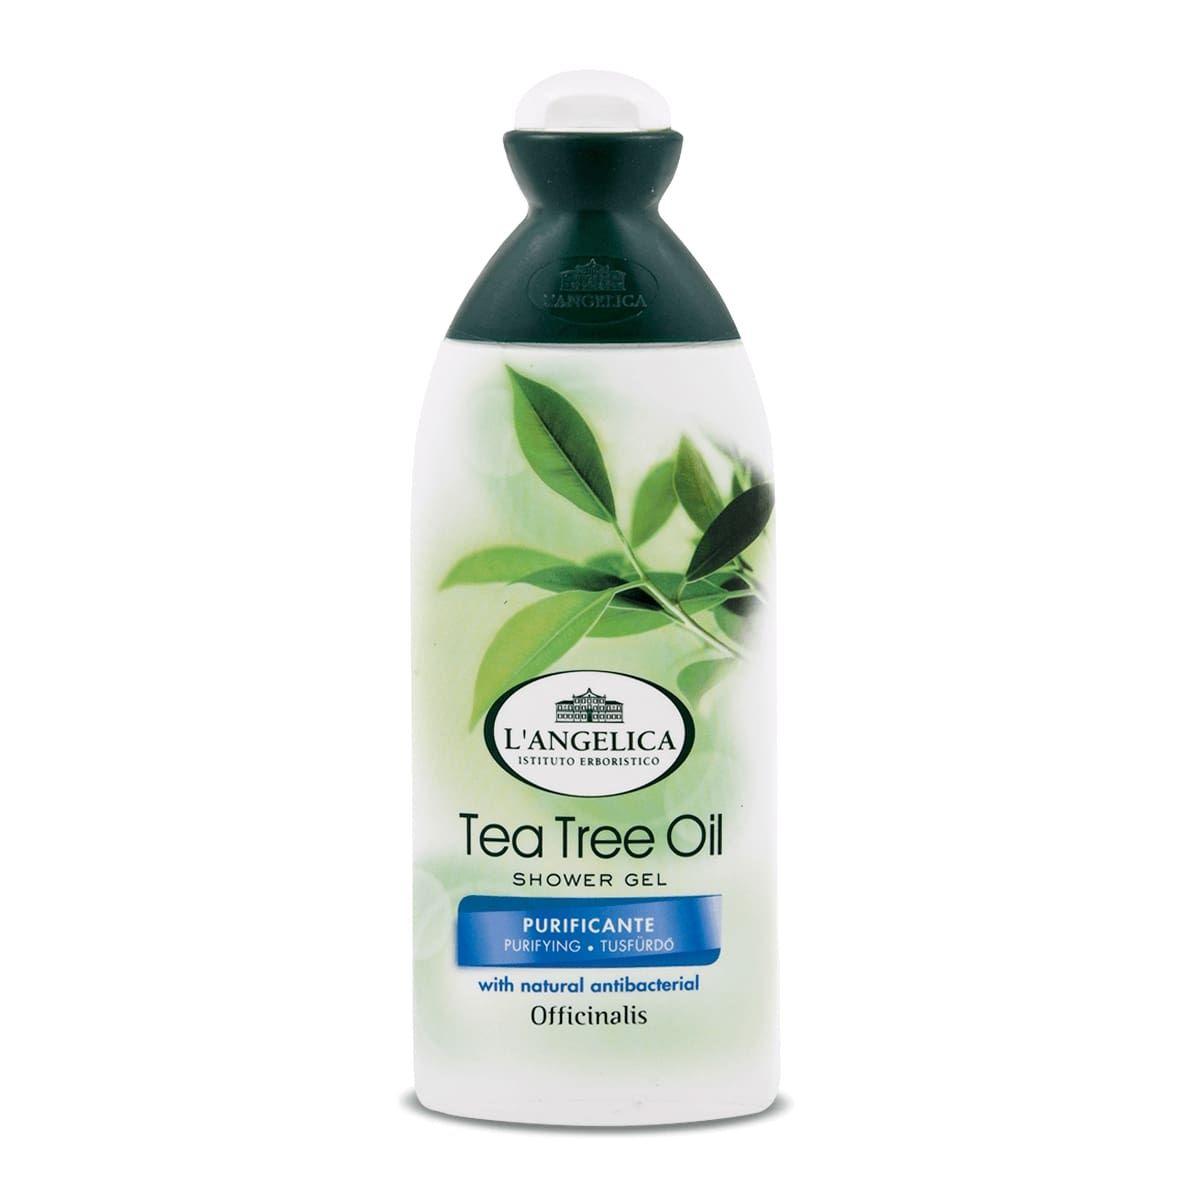 Docciaschiuma Purificante Tea Tree Oil